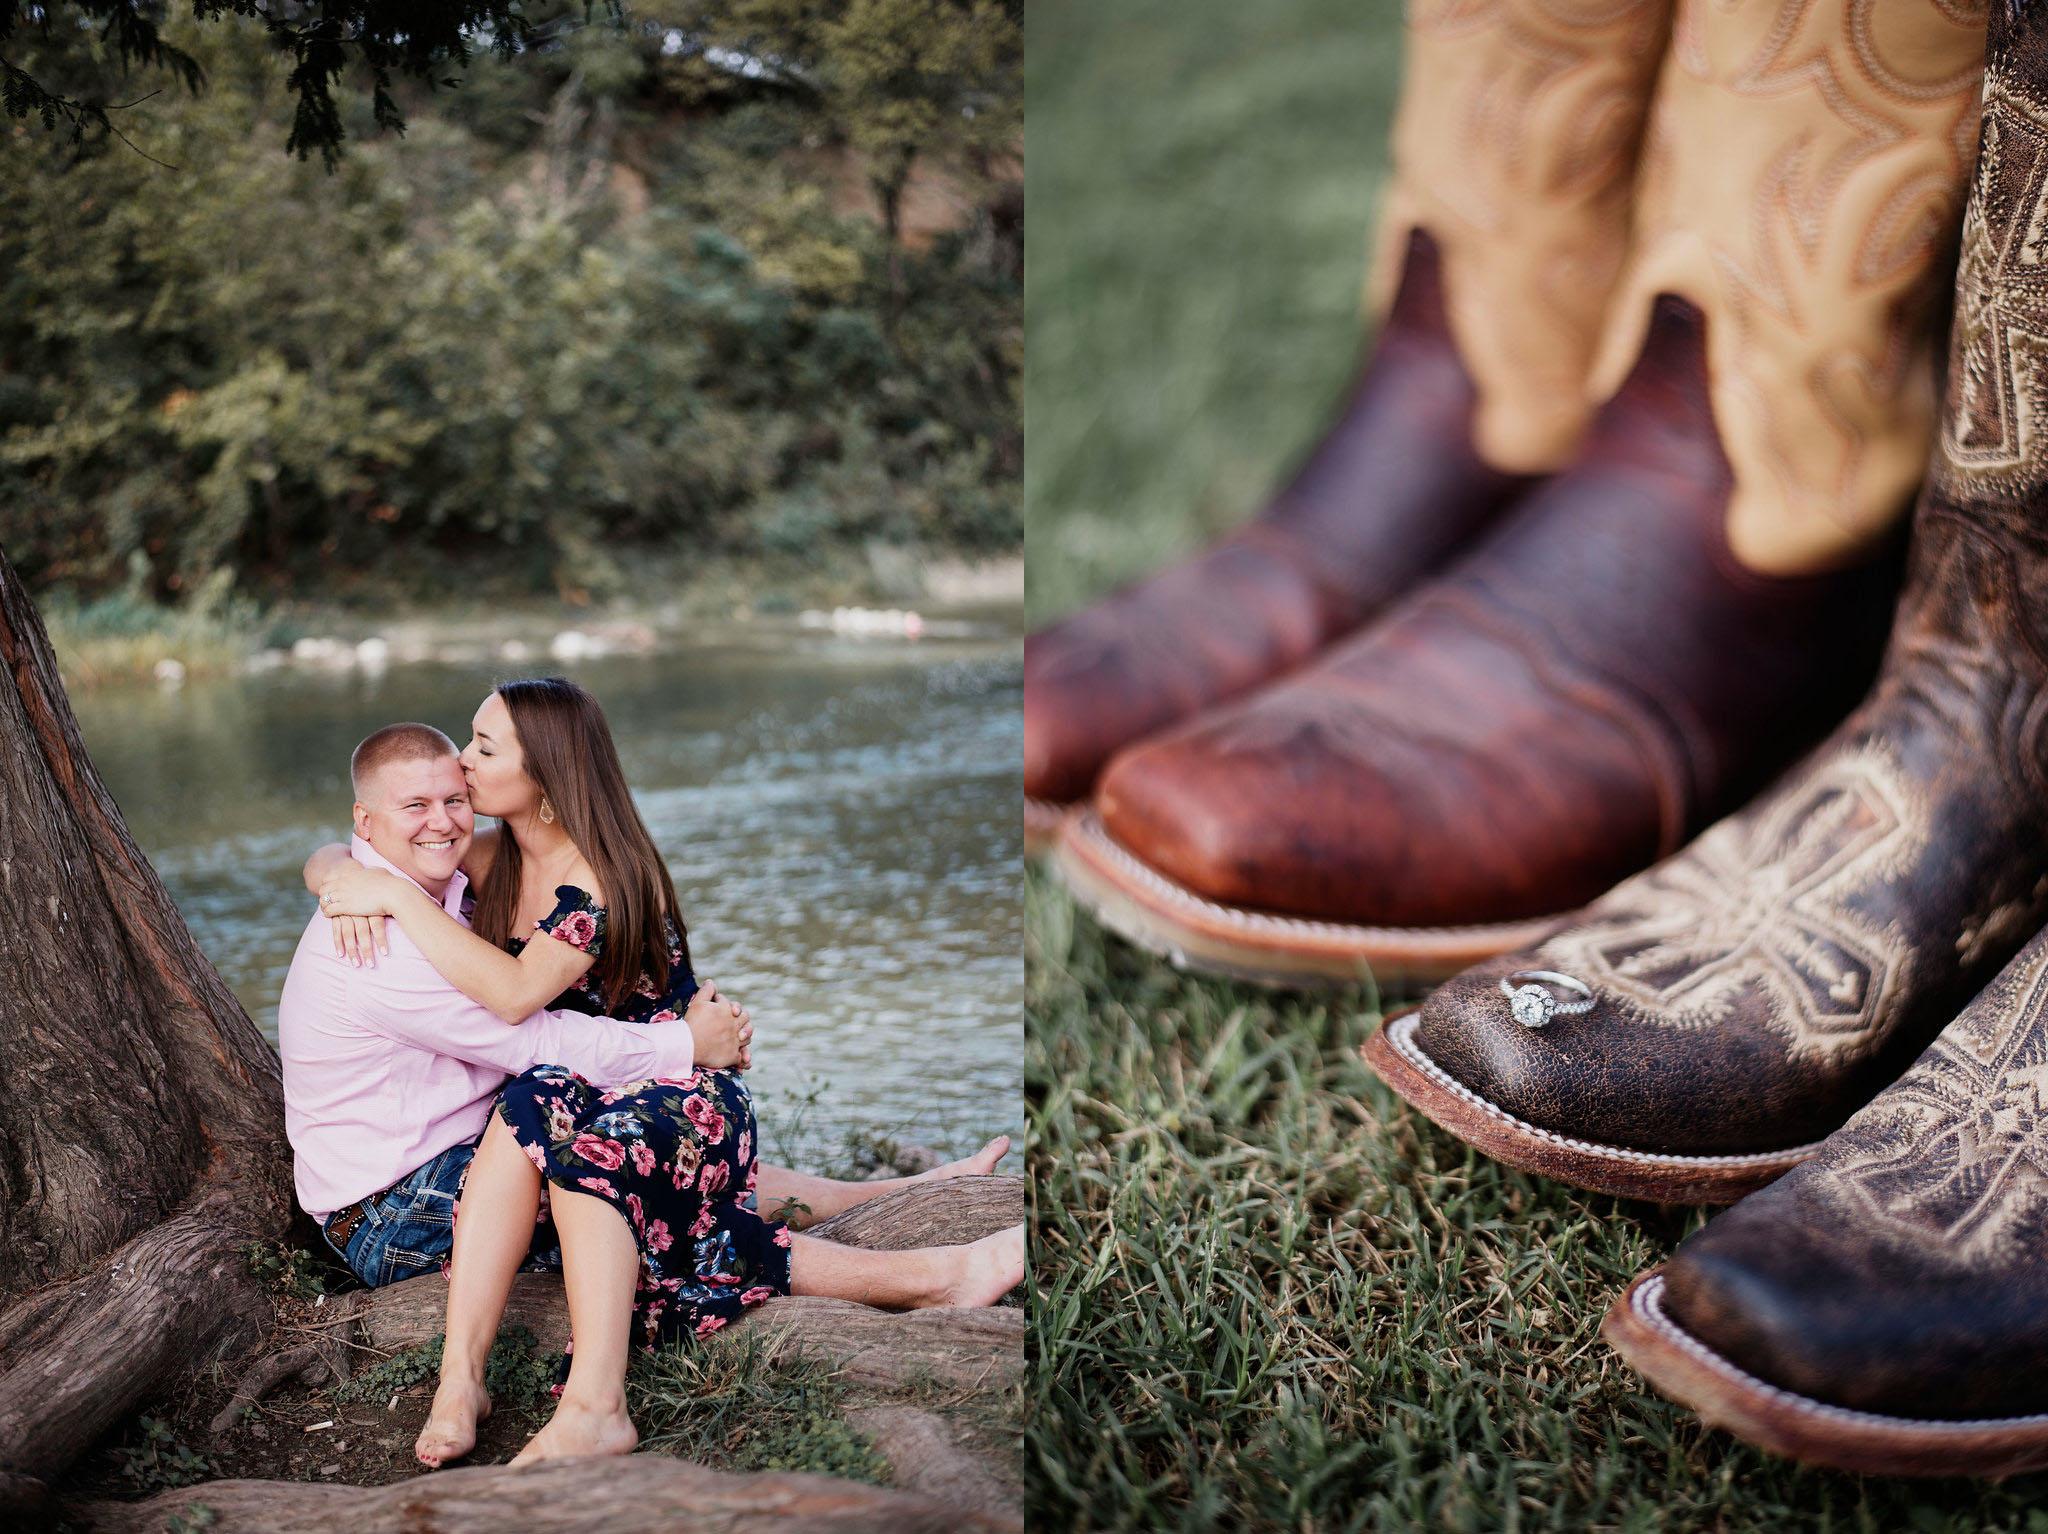 EffJay Photography Gruene TX Engagement Session Destination Wedding Photographer031 copy.jpg